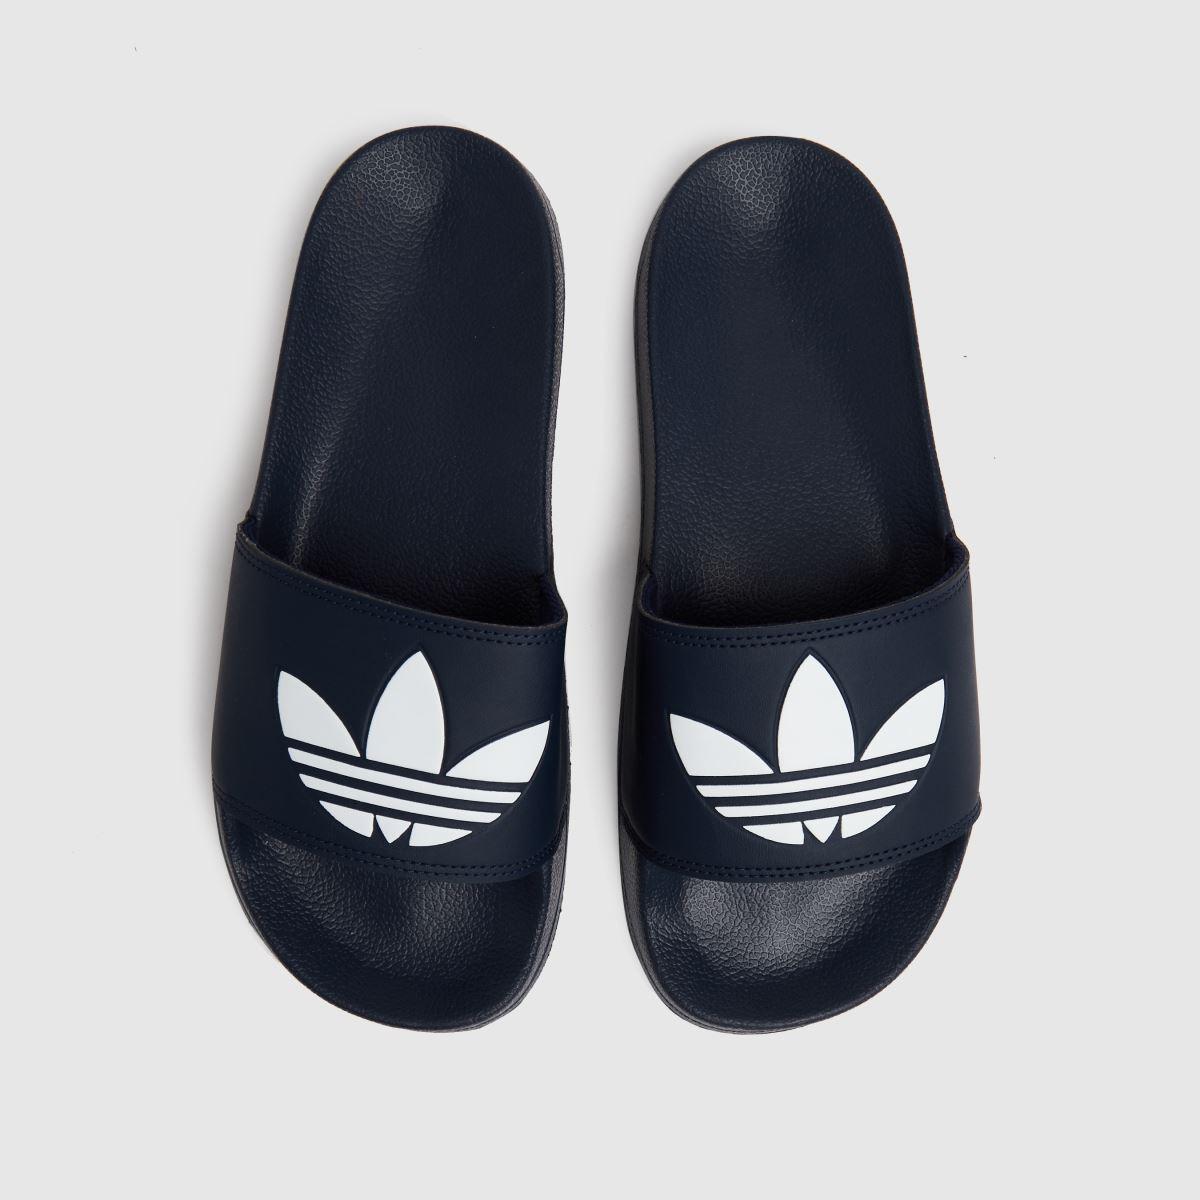 Adidas Navy & White Adilette Lite Sandals